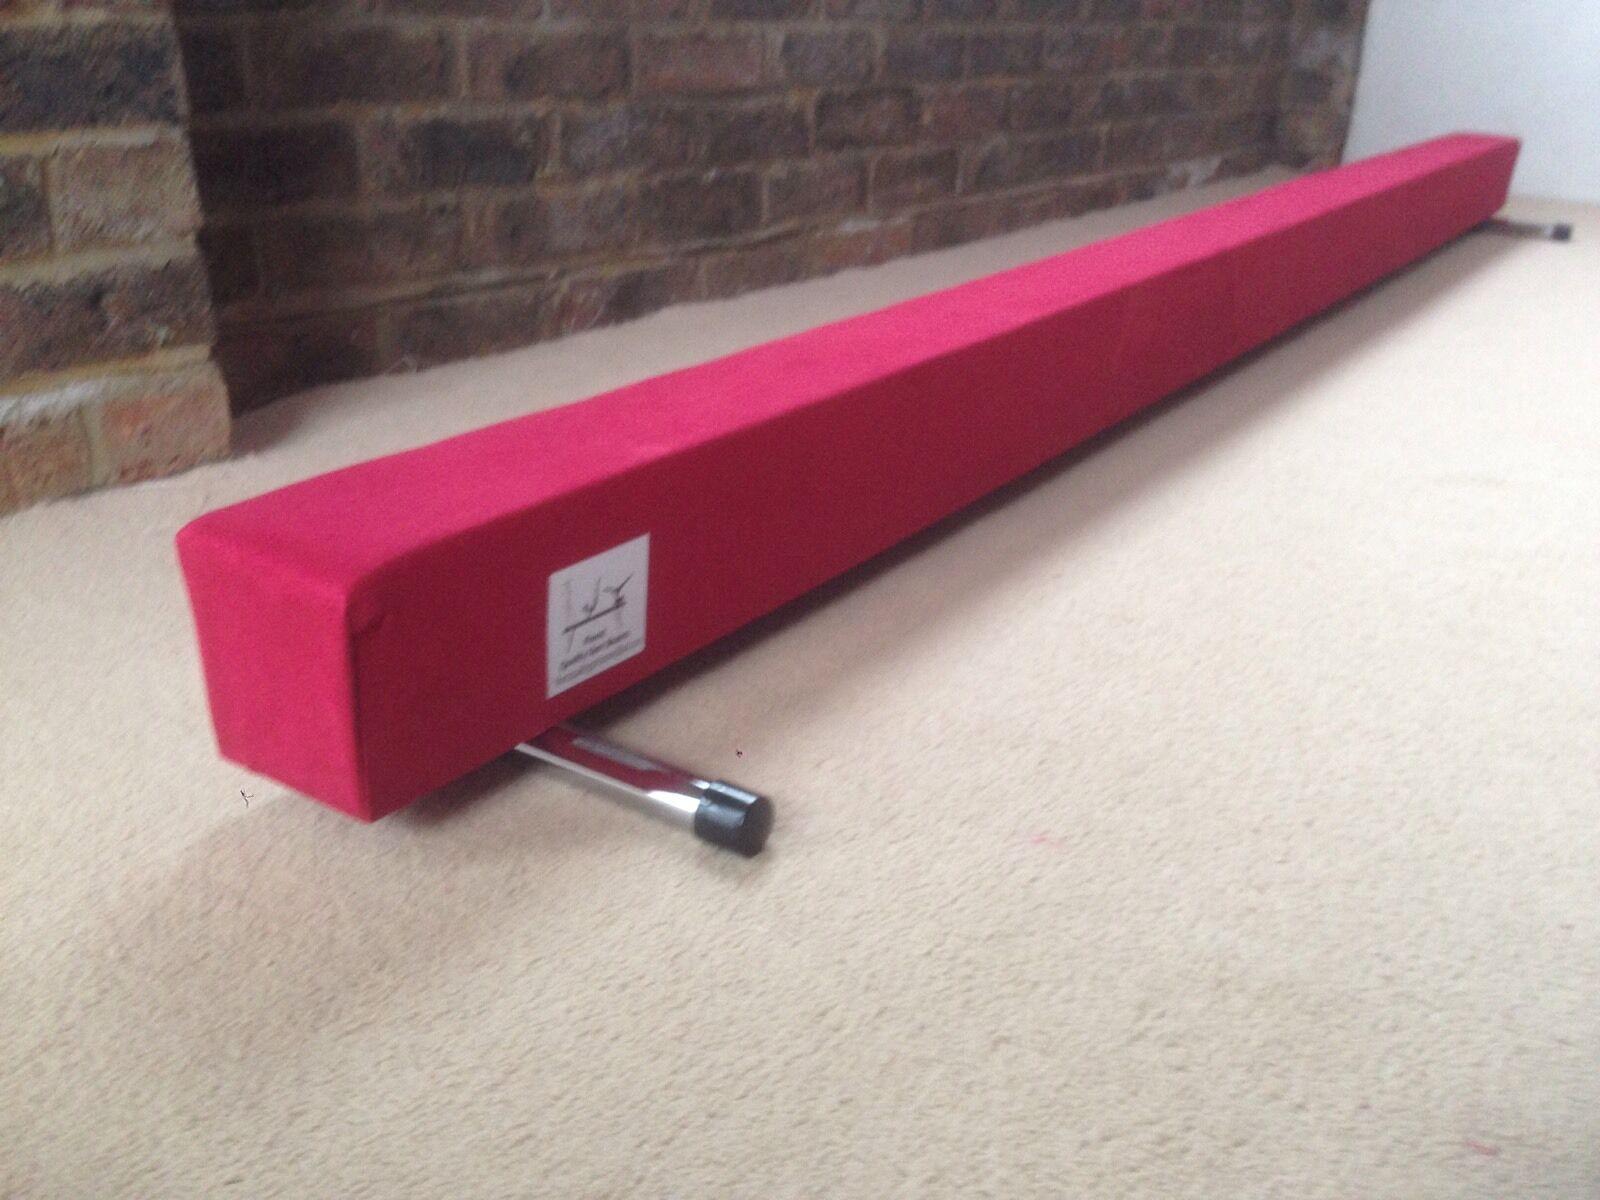 Finest quality gymnastics gym balance beam  10FT long red reduced bargain